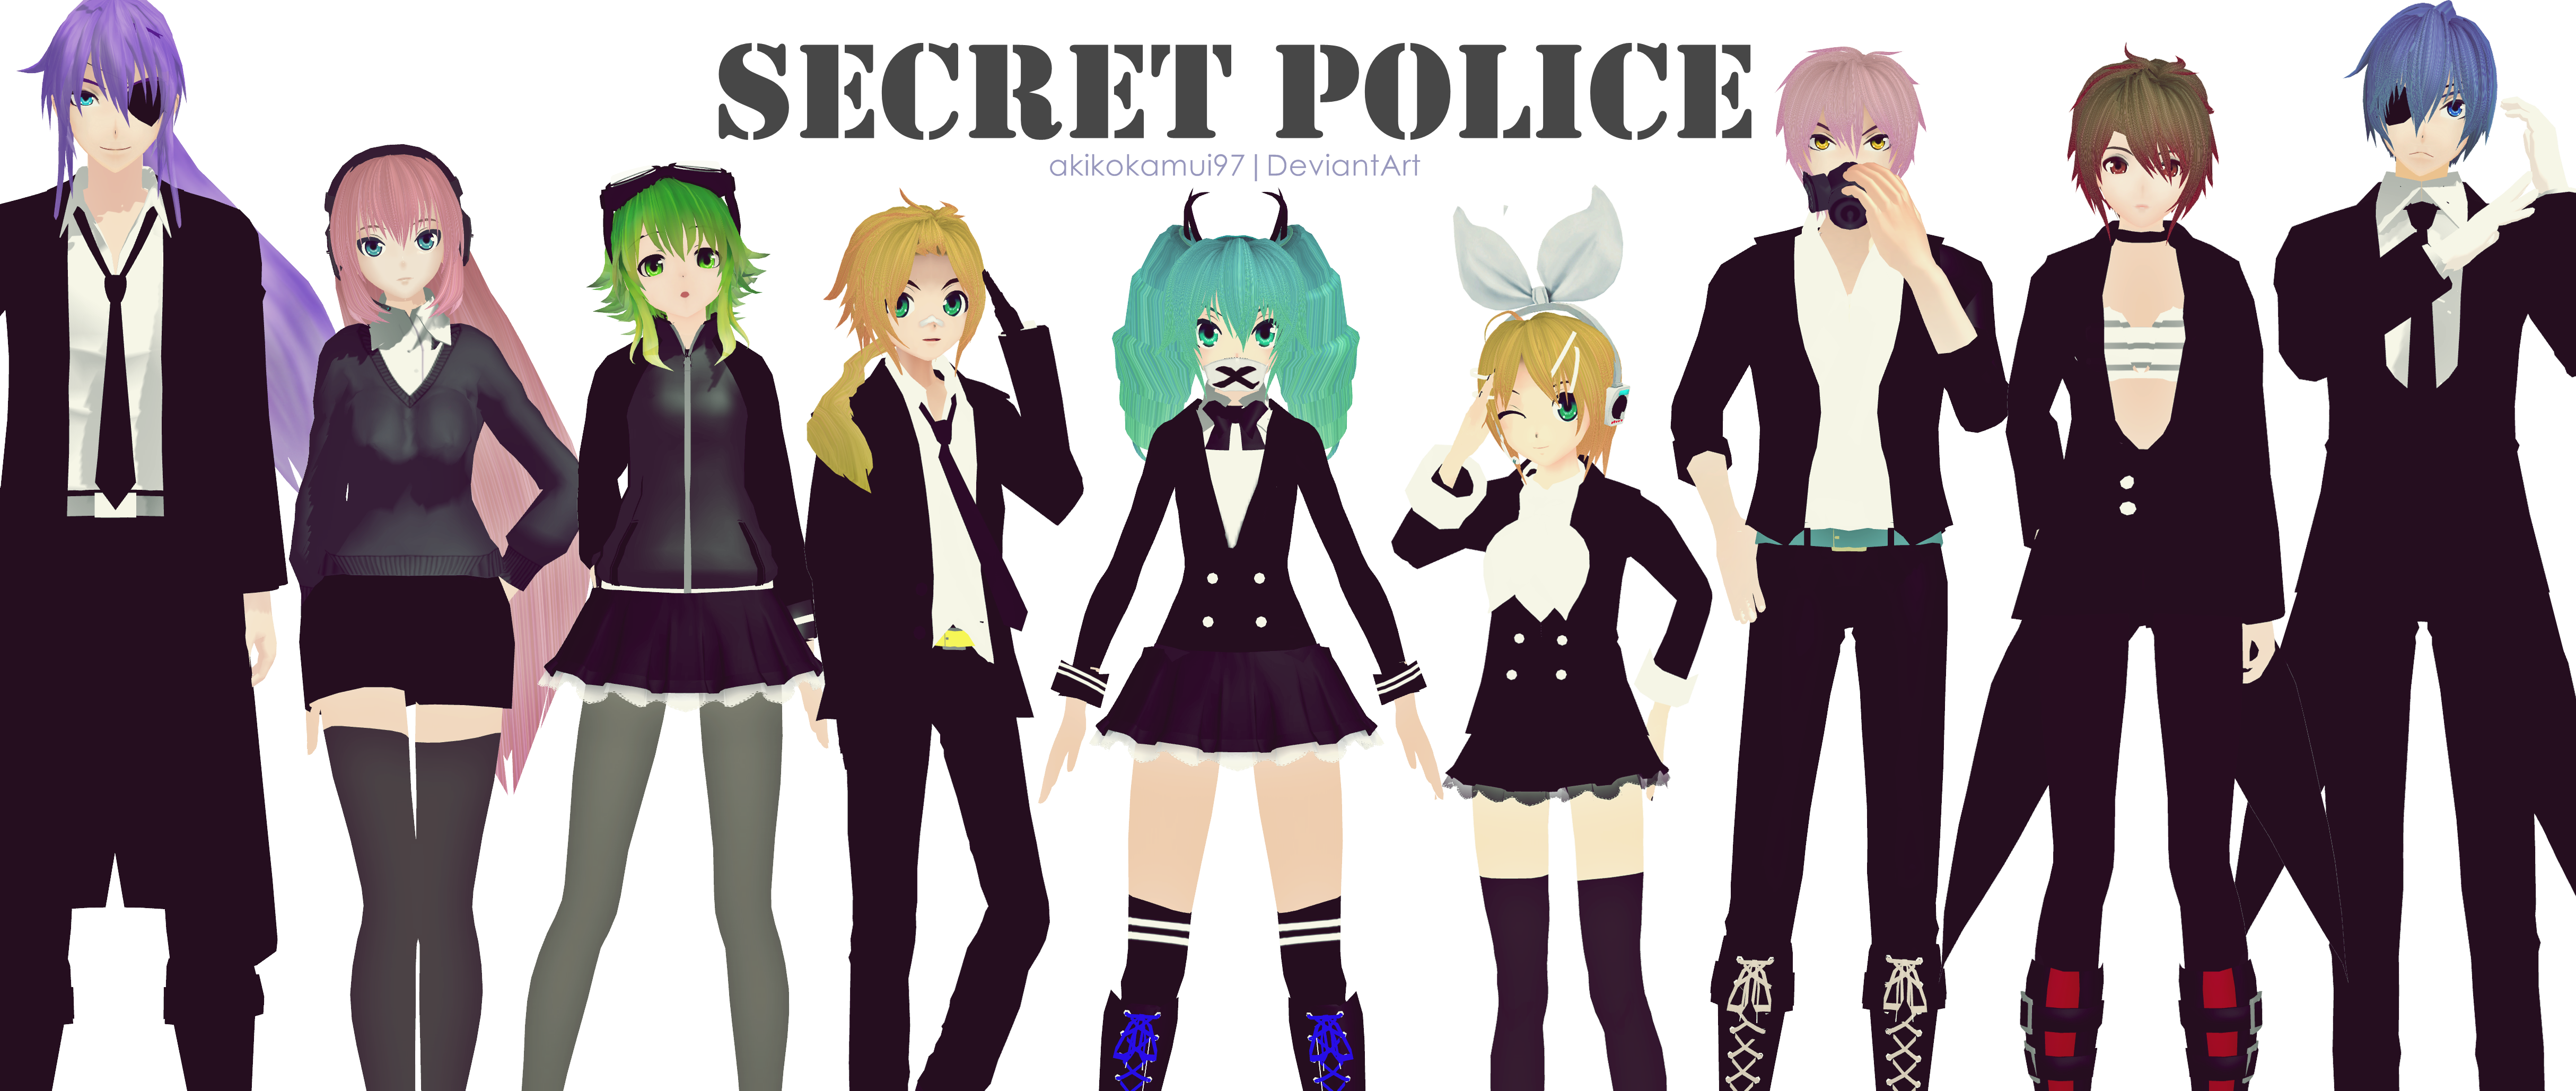 Mmd Pd Vocaloid Secret Police Link Download By